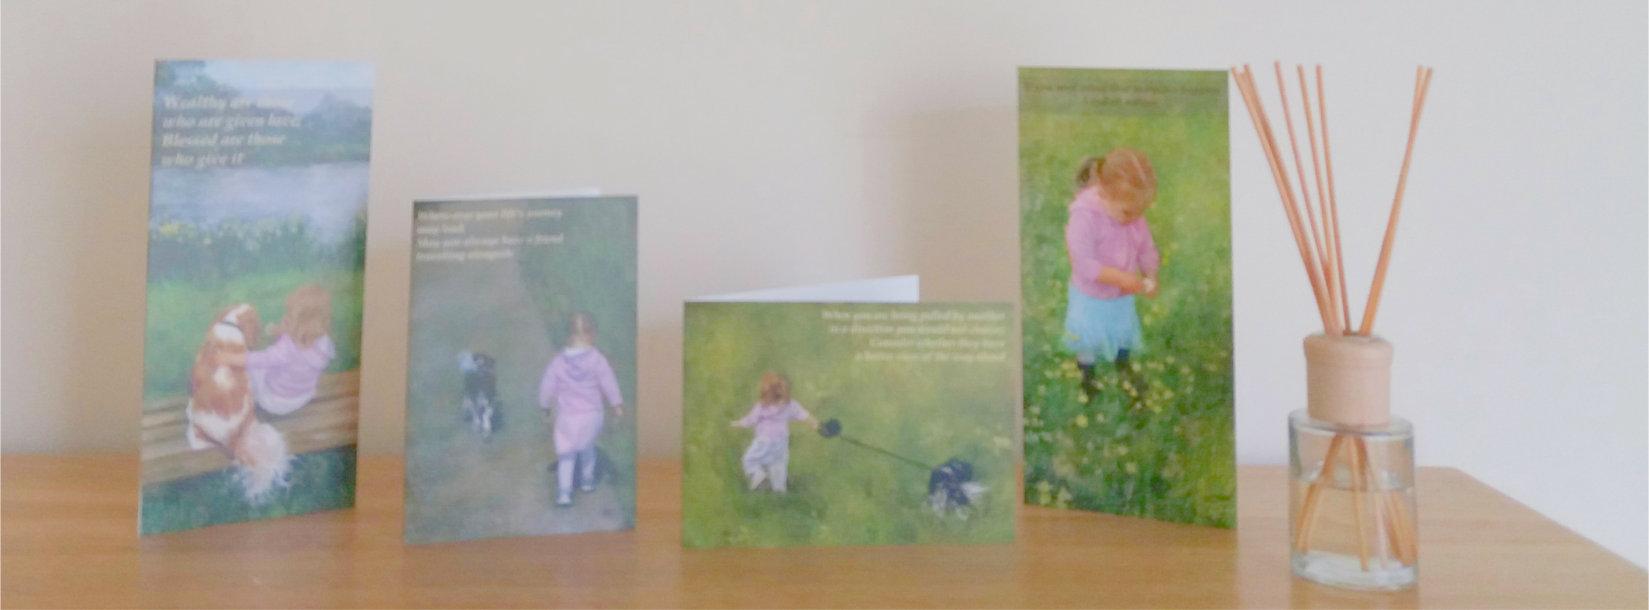 willow-wisdom-card-banner.jpg